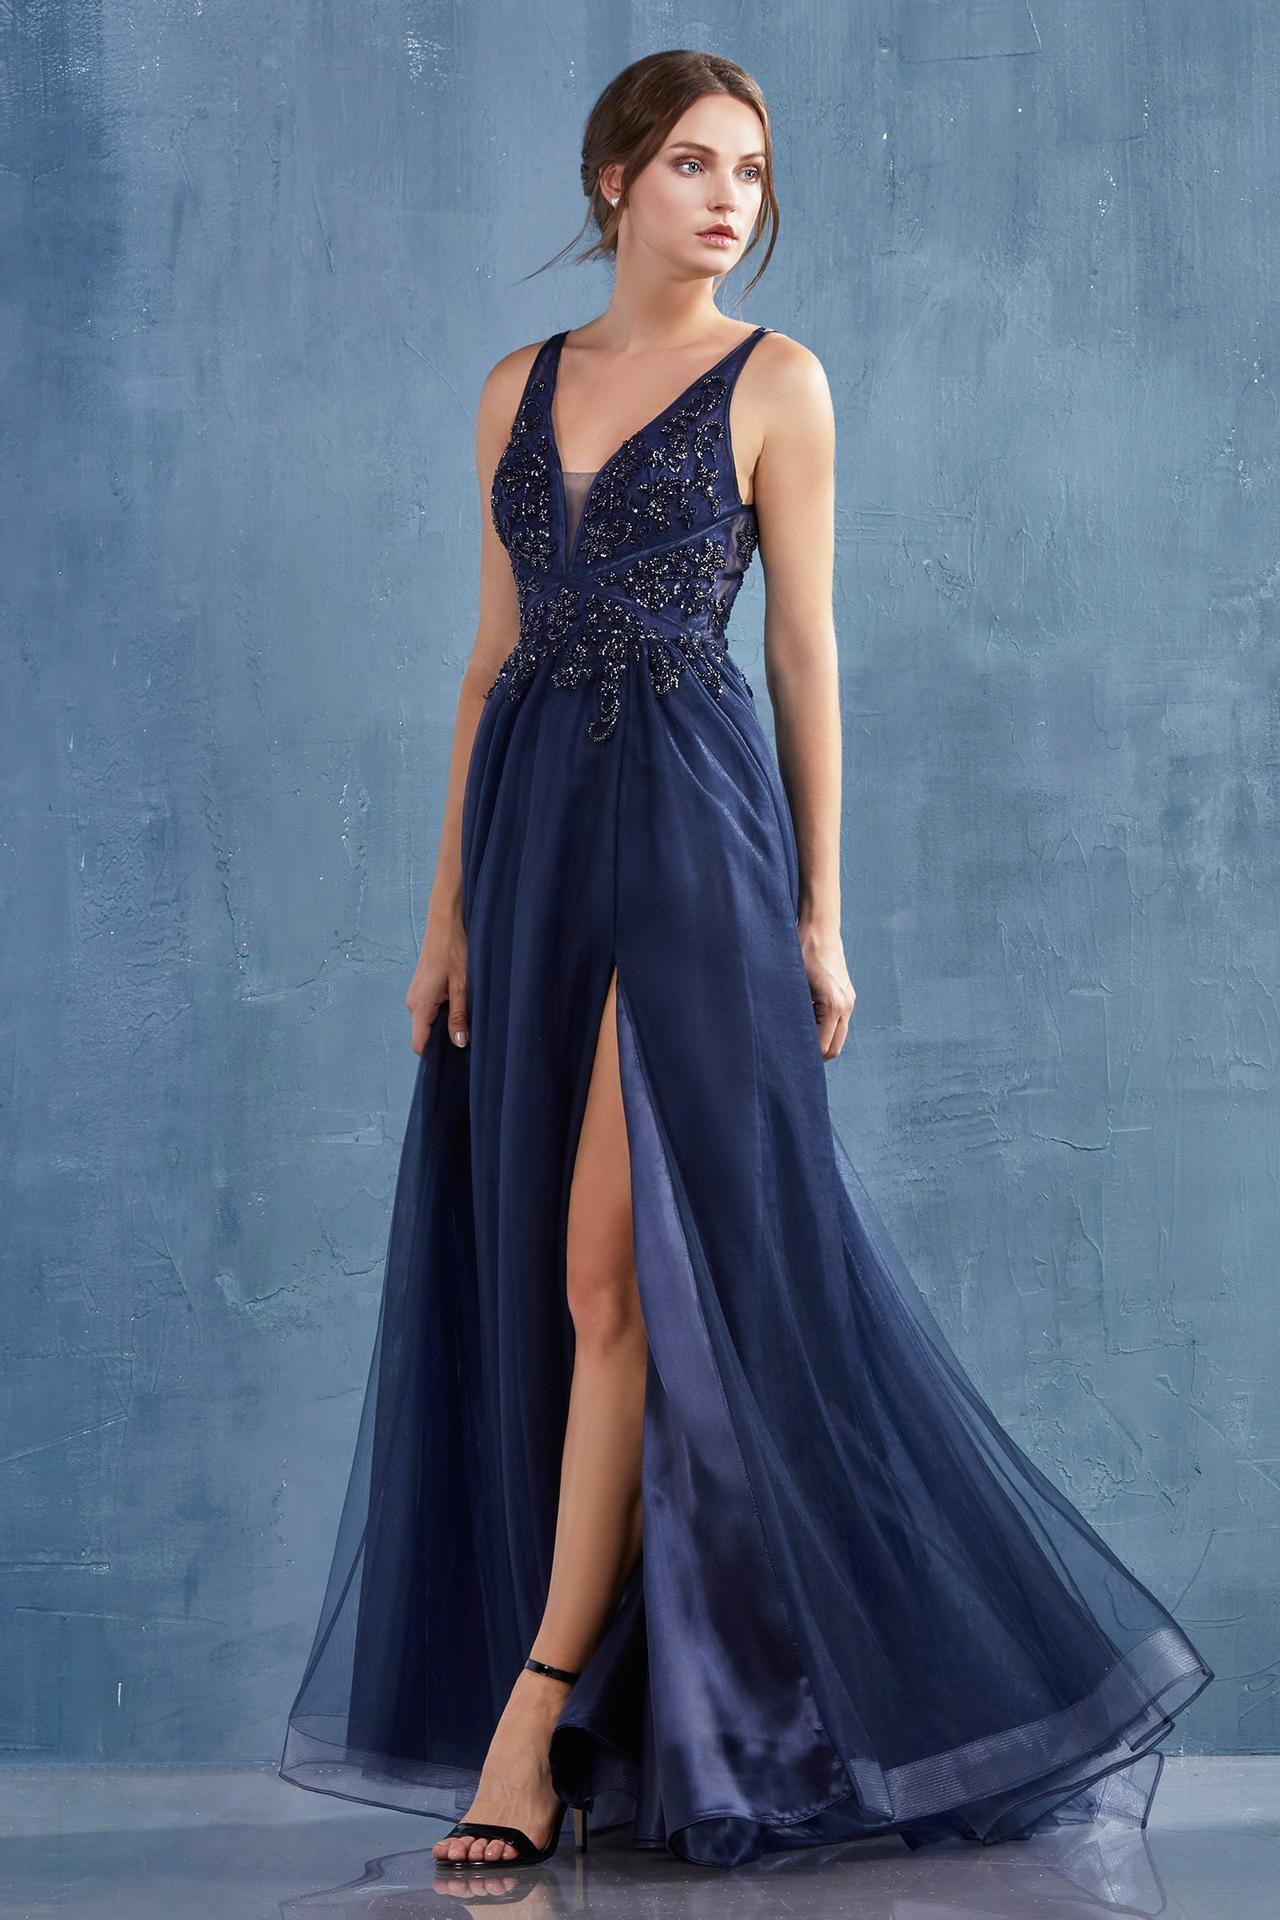 Nové spoločenské šaty :) - Obrázok č. 36